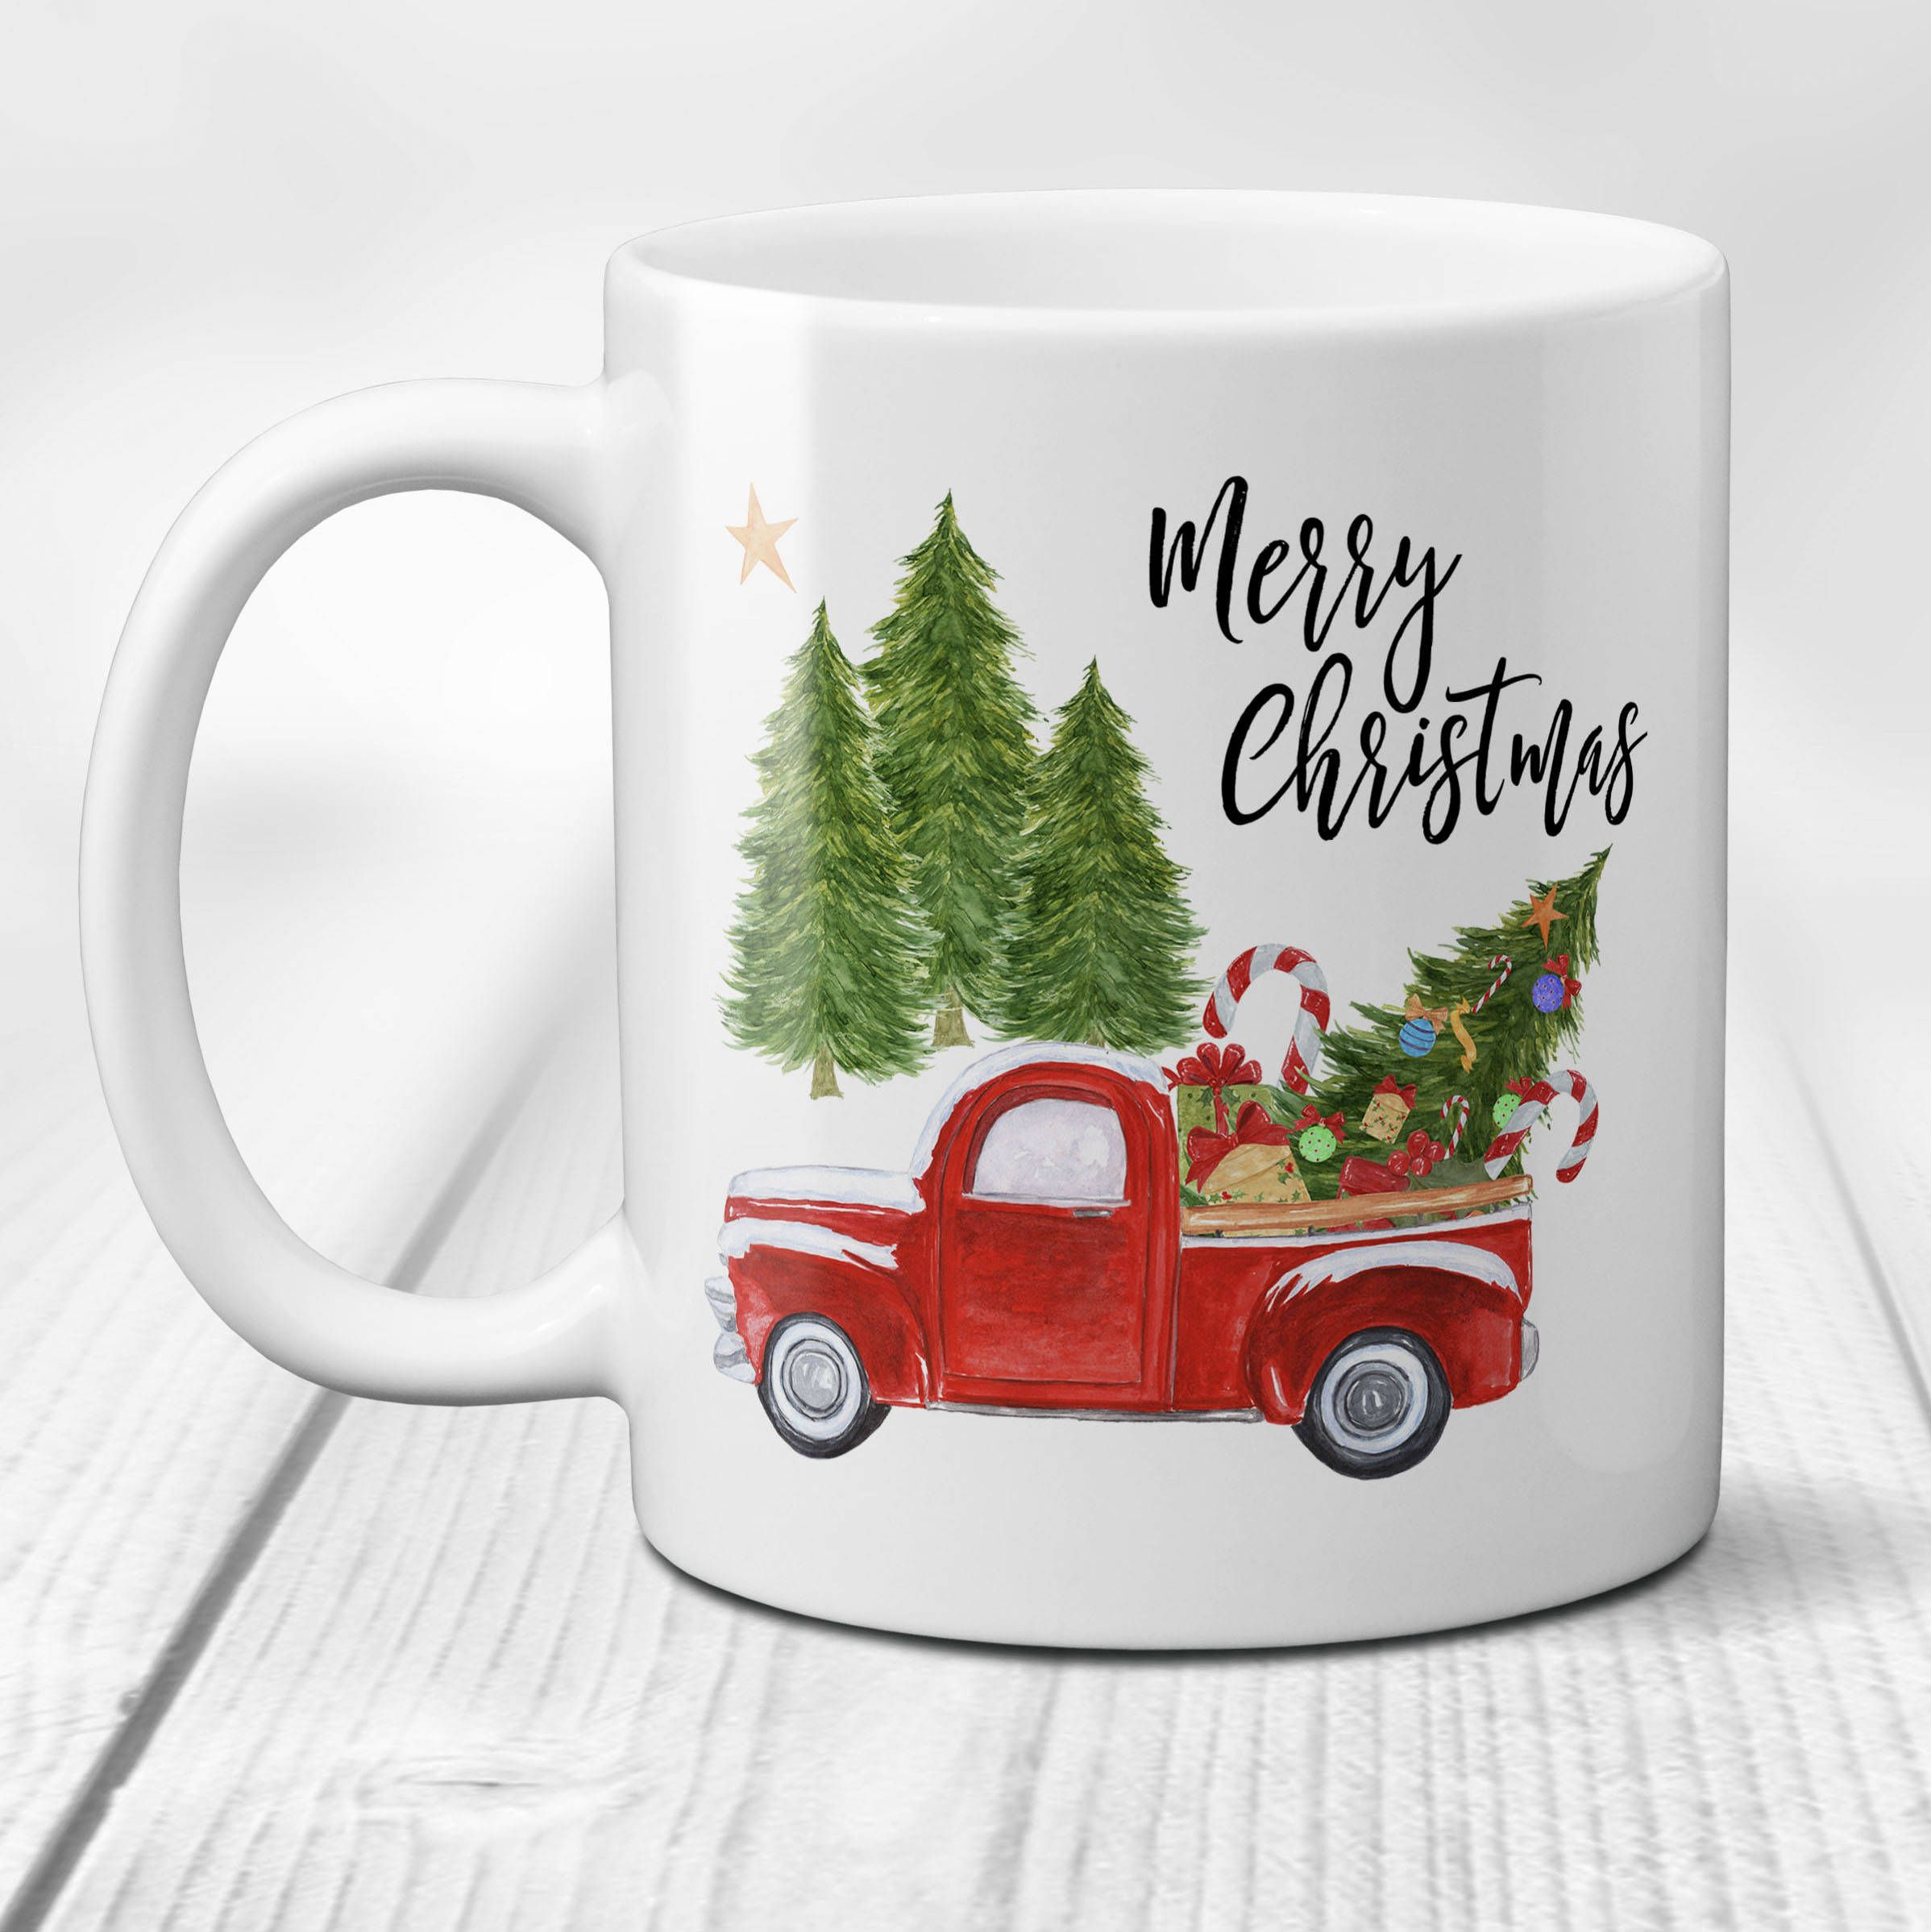 Red Christmas Truck Ceramic Coffee Mug, Merry Christmas